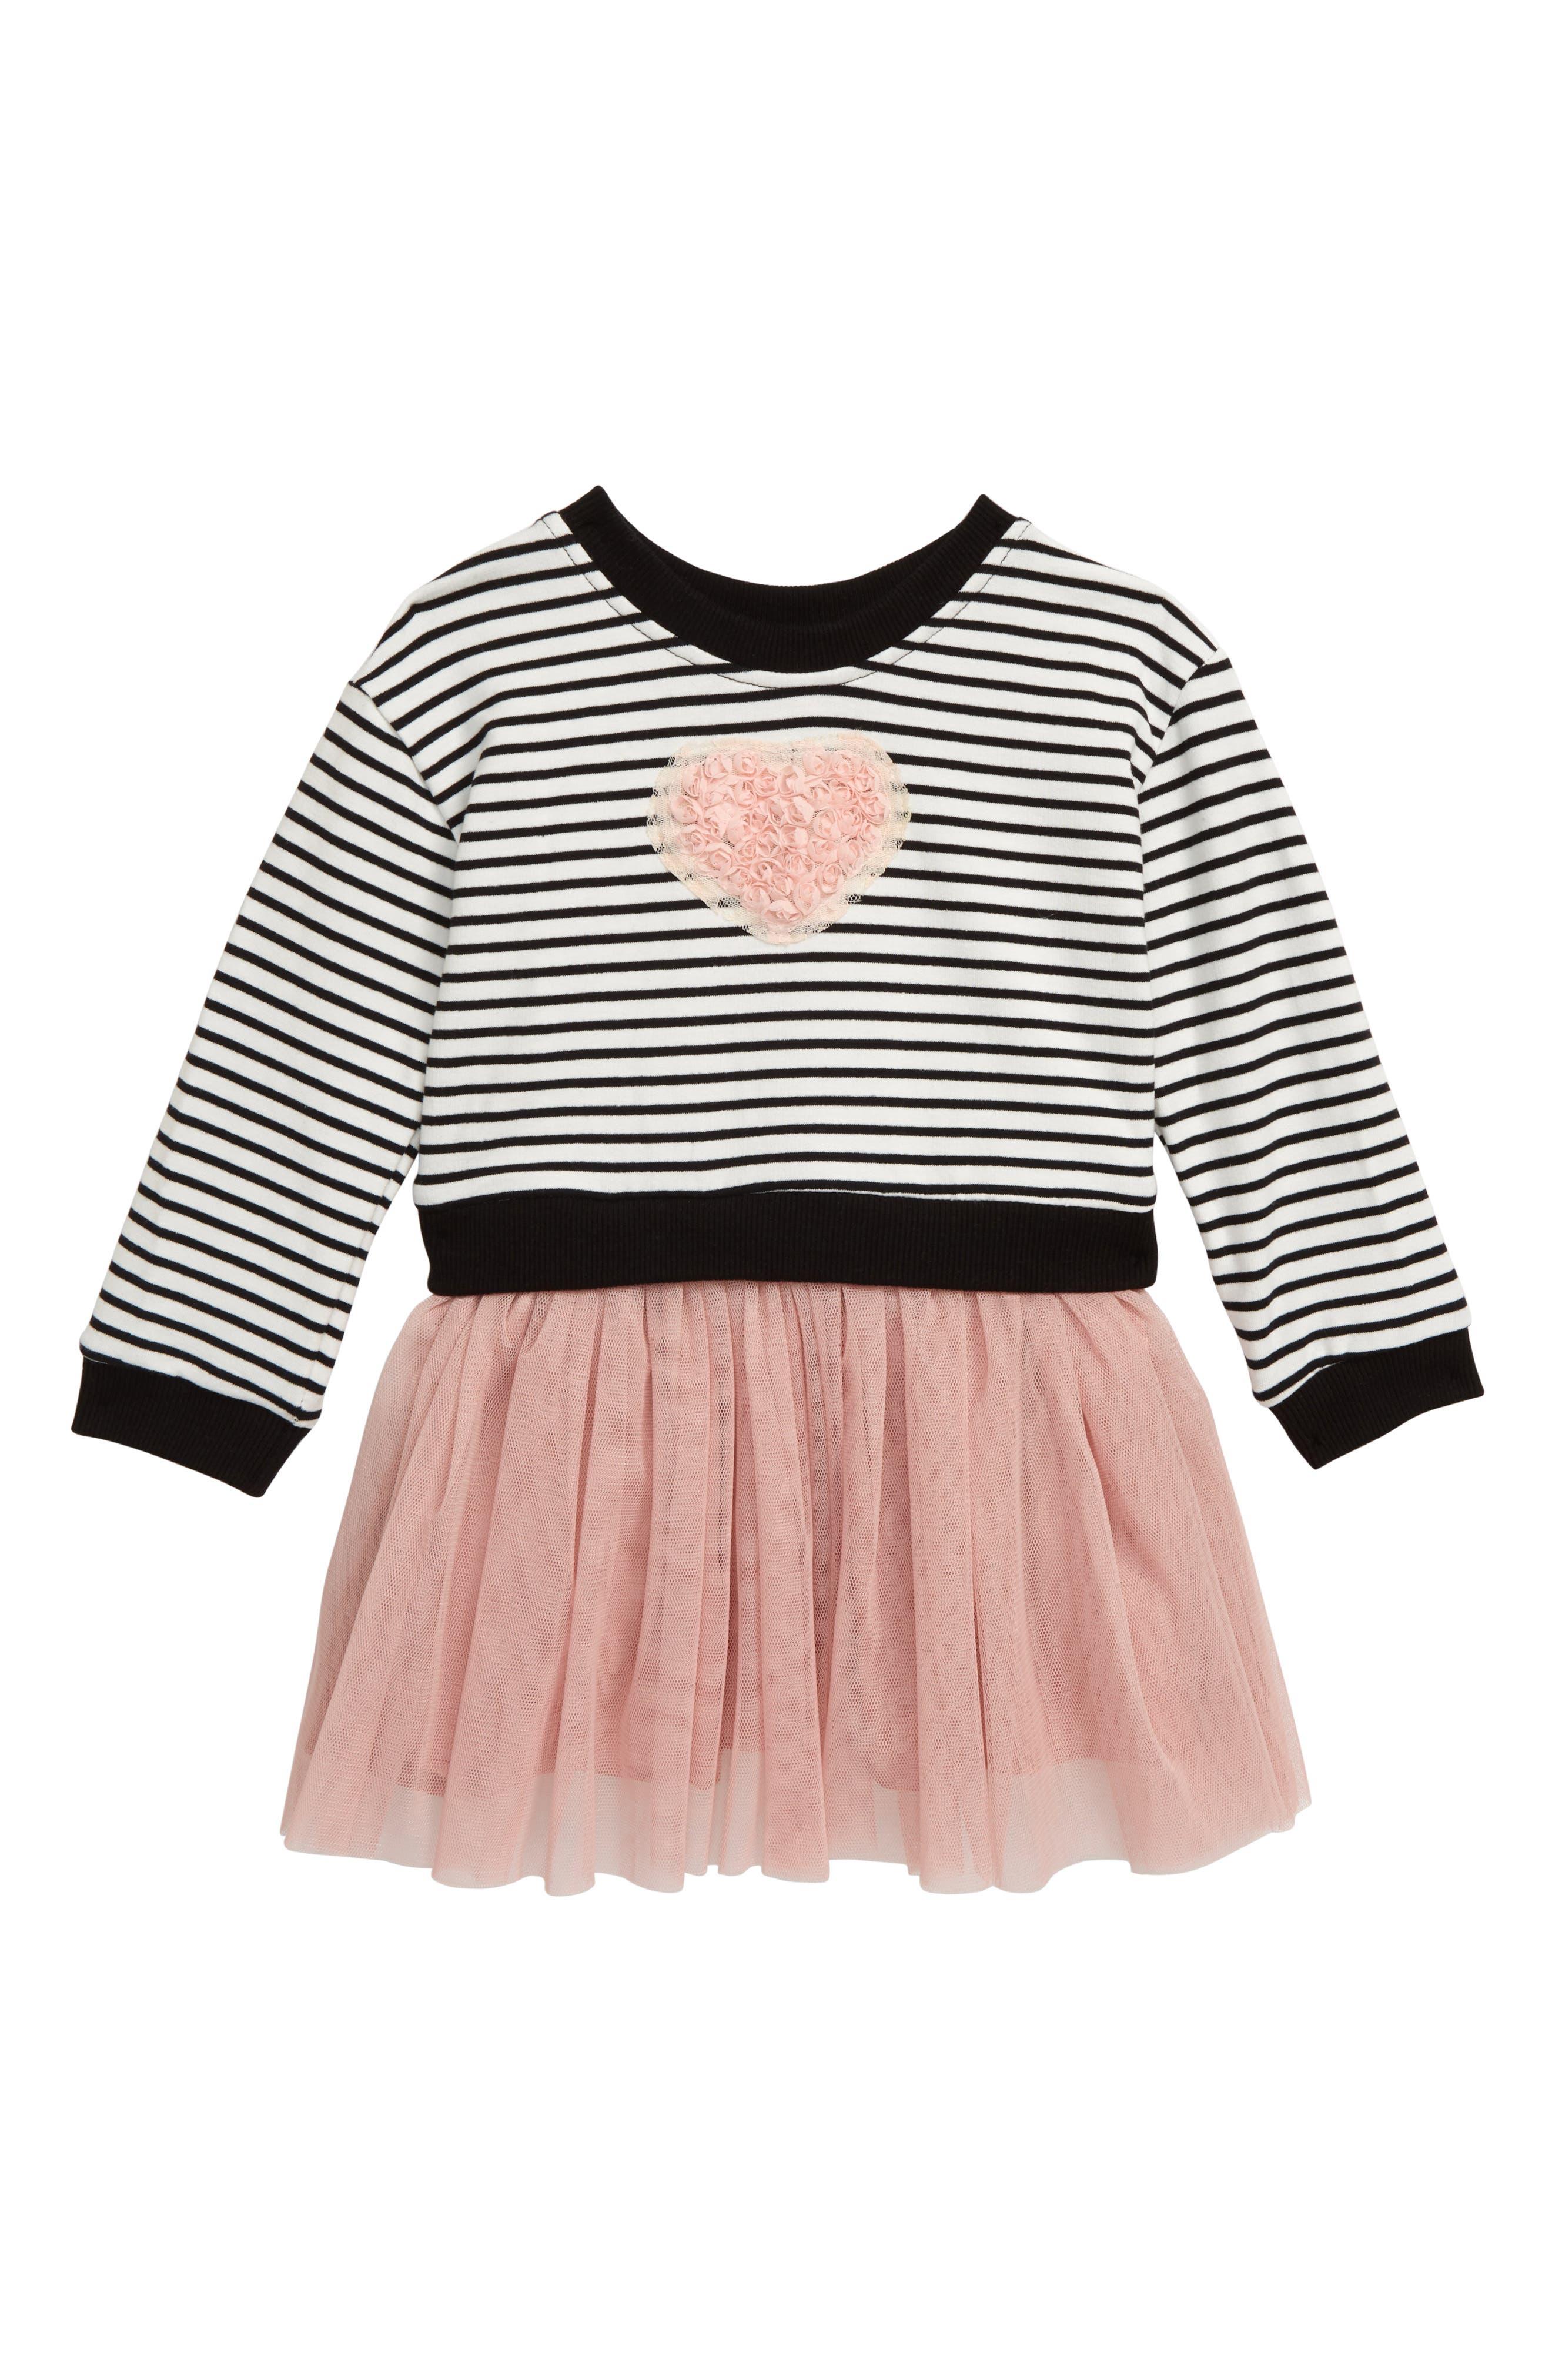 Image of Popatu Stripe Bodice Tulle Skirted Dress